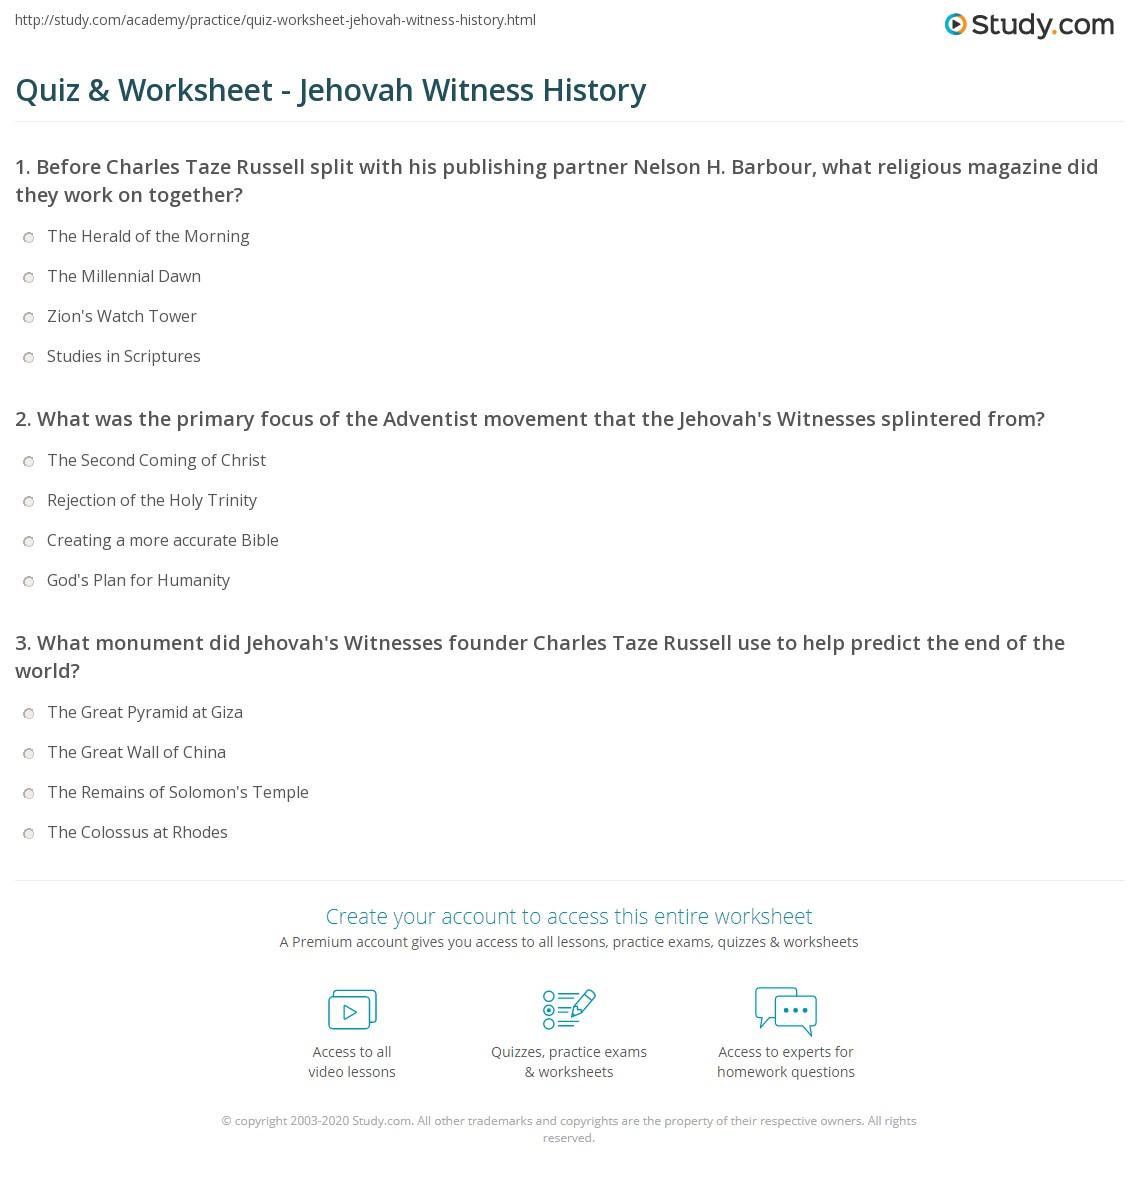 Quiz & Worksheet - Jehovah Witness History | Study com